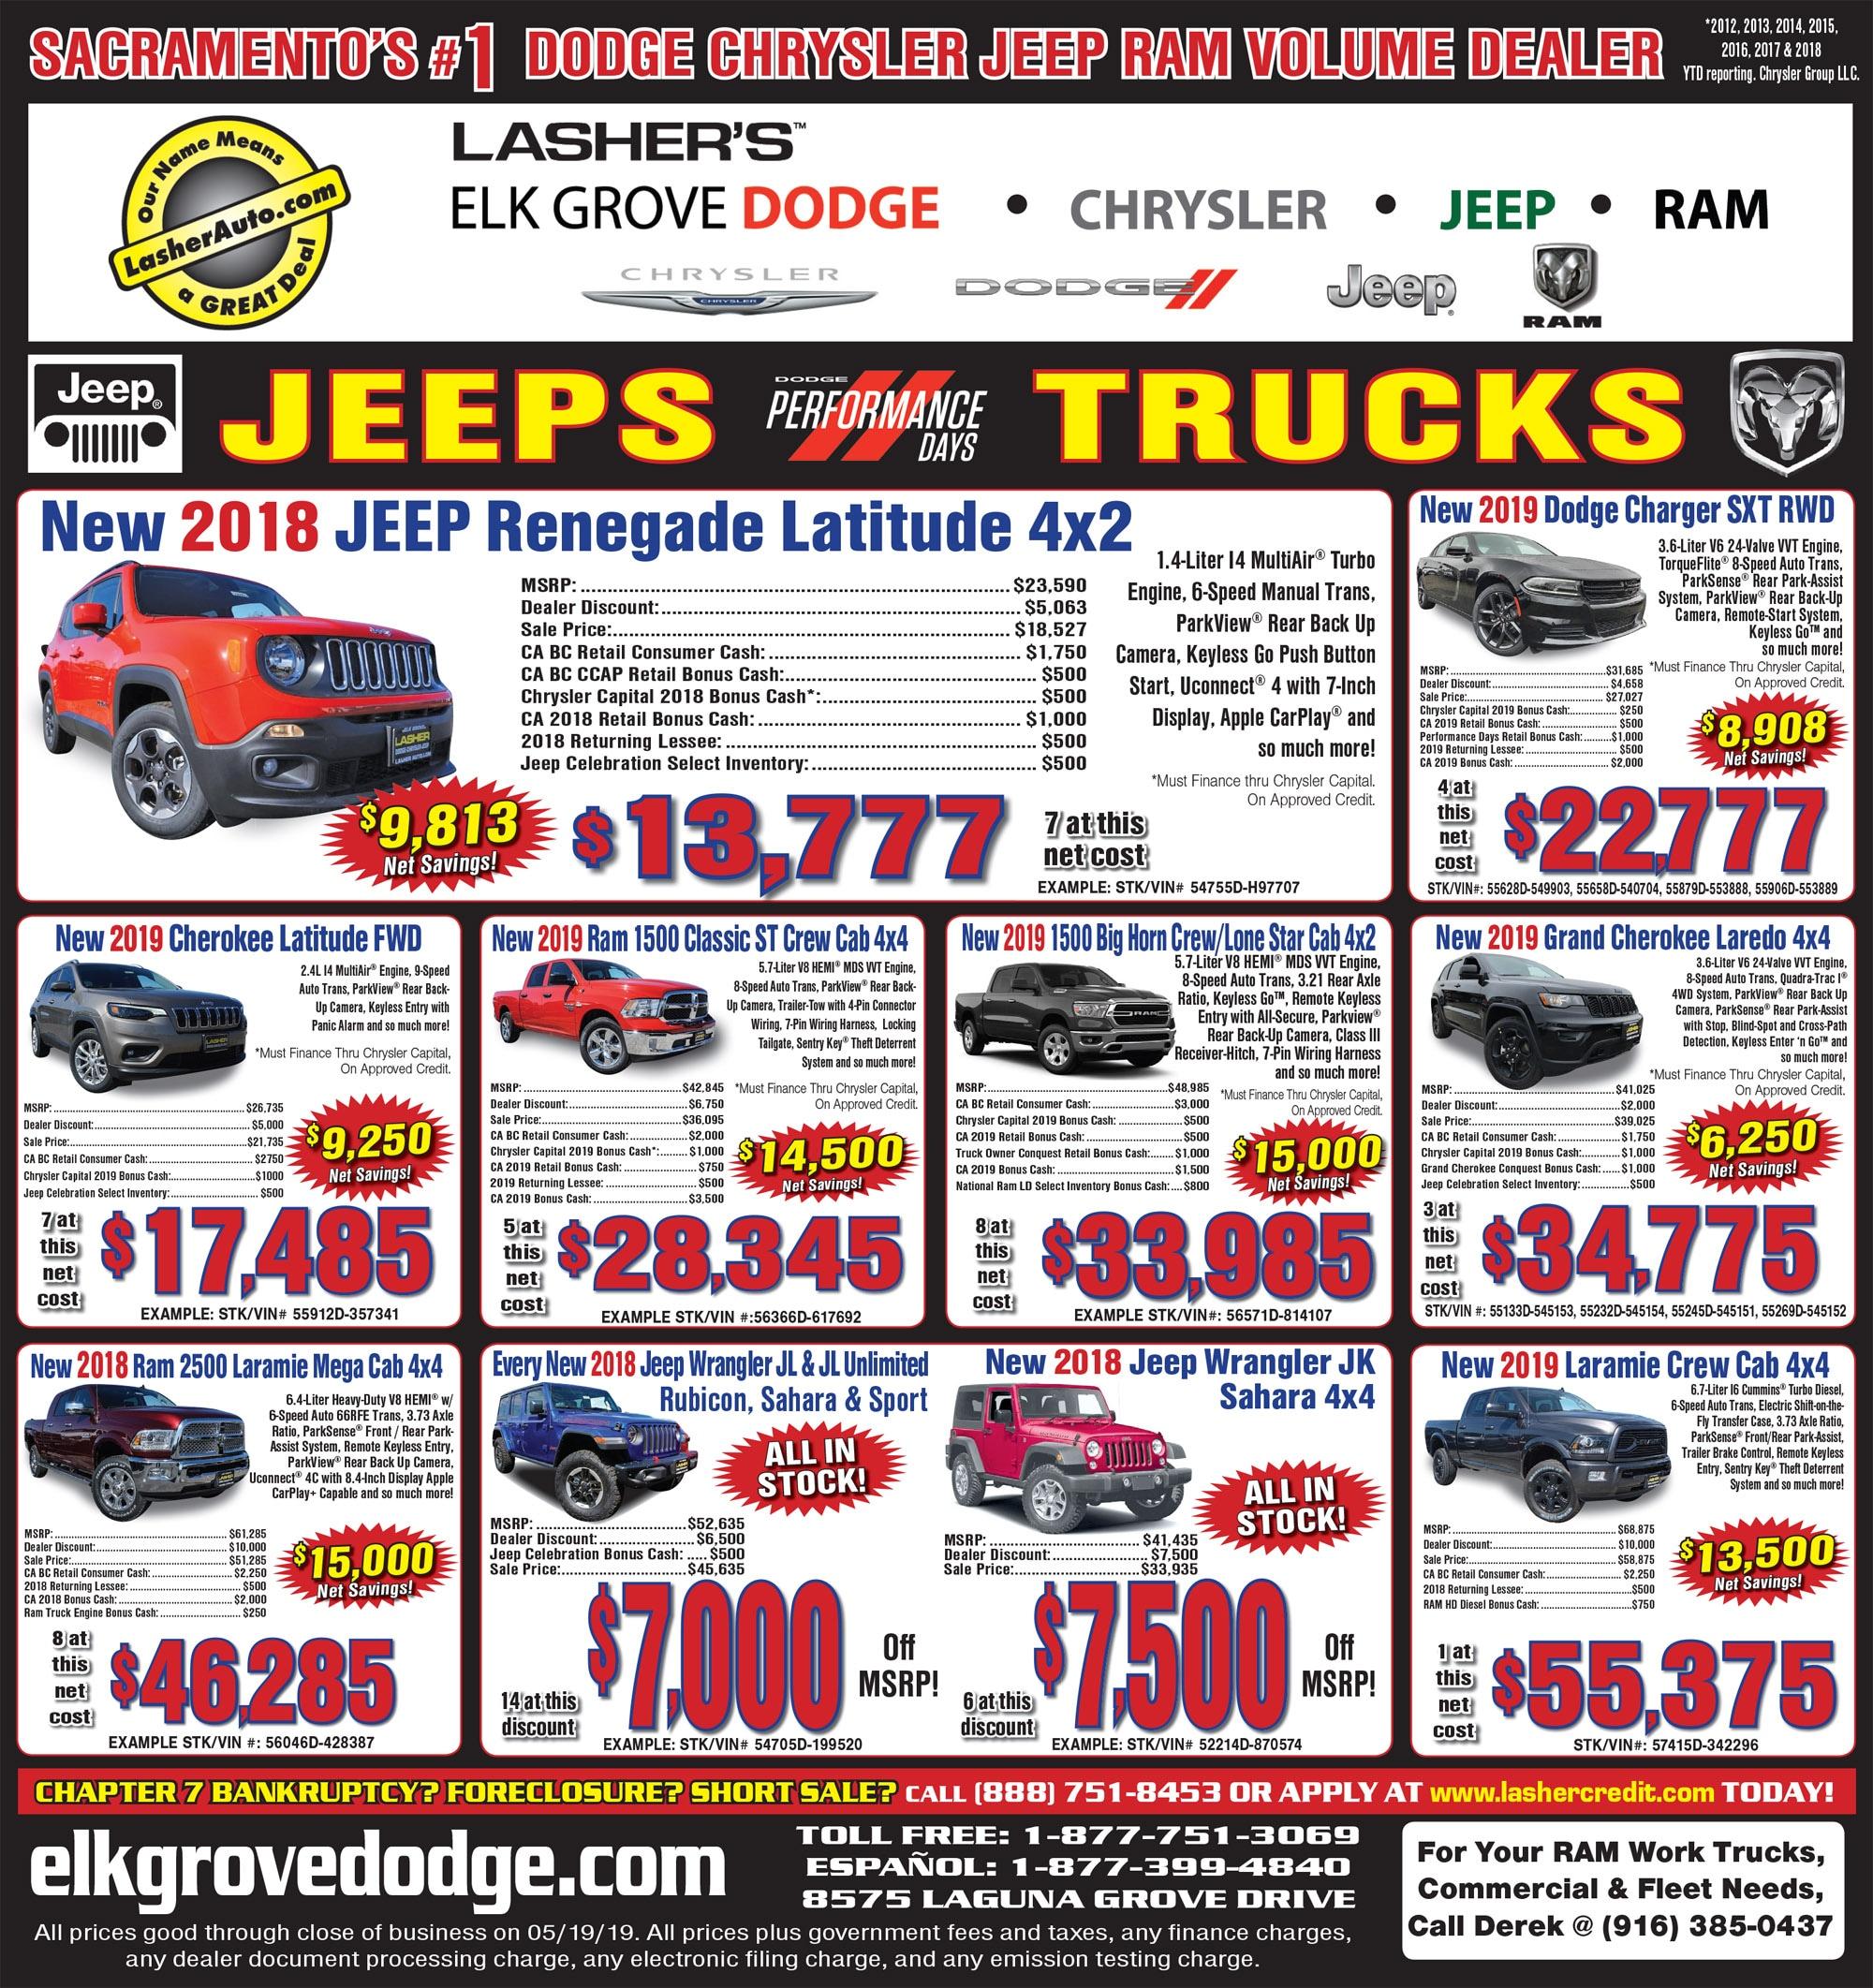 Dodge Ram Jeep Sacramento Bee Ad For Elk Grove Dodge Chrysler Jeep